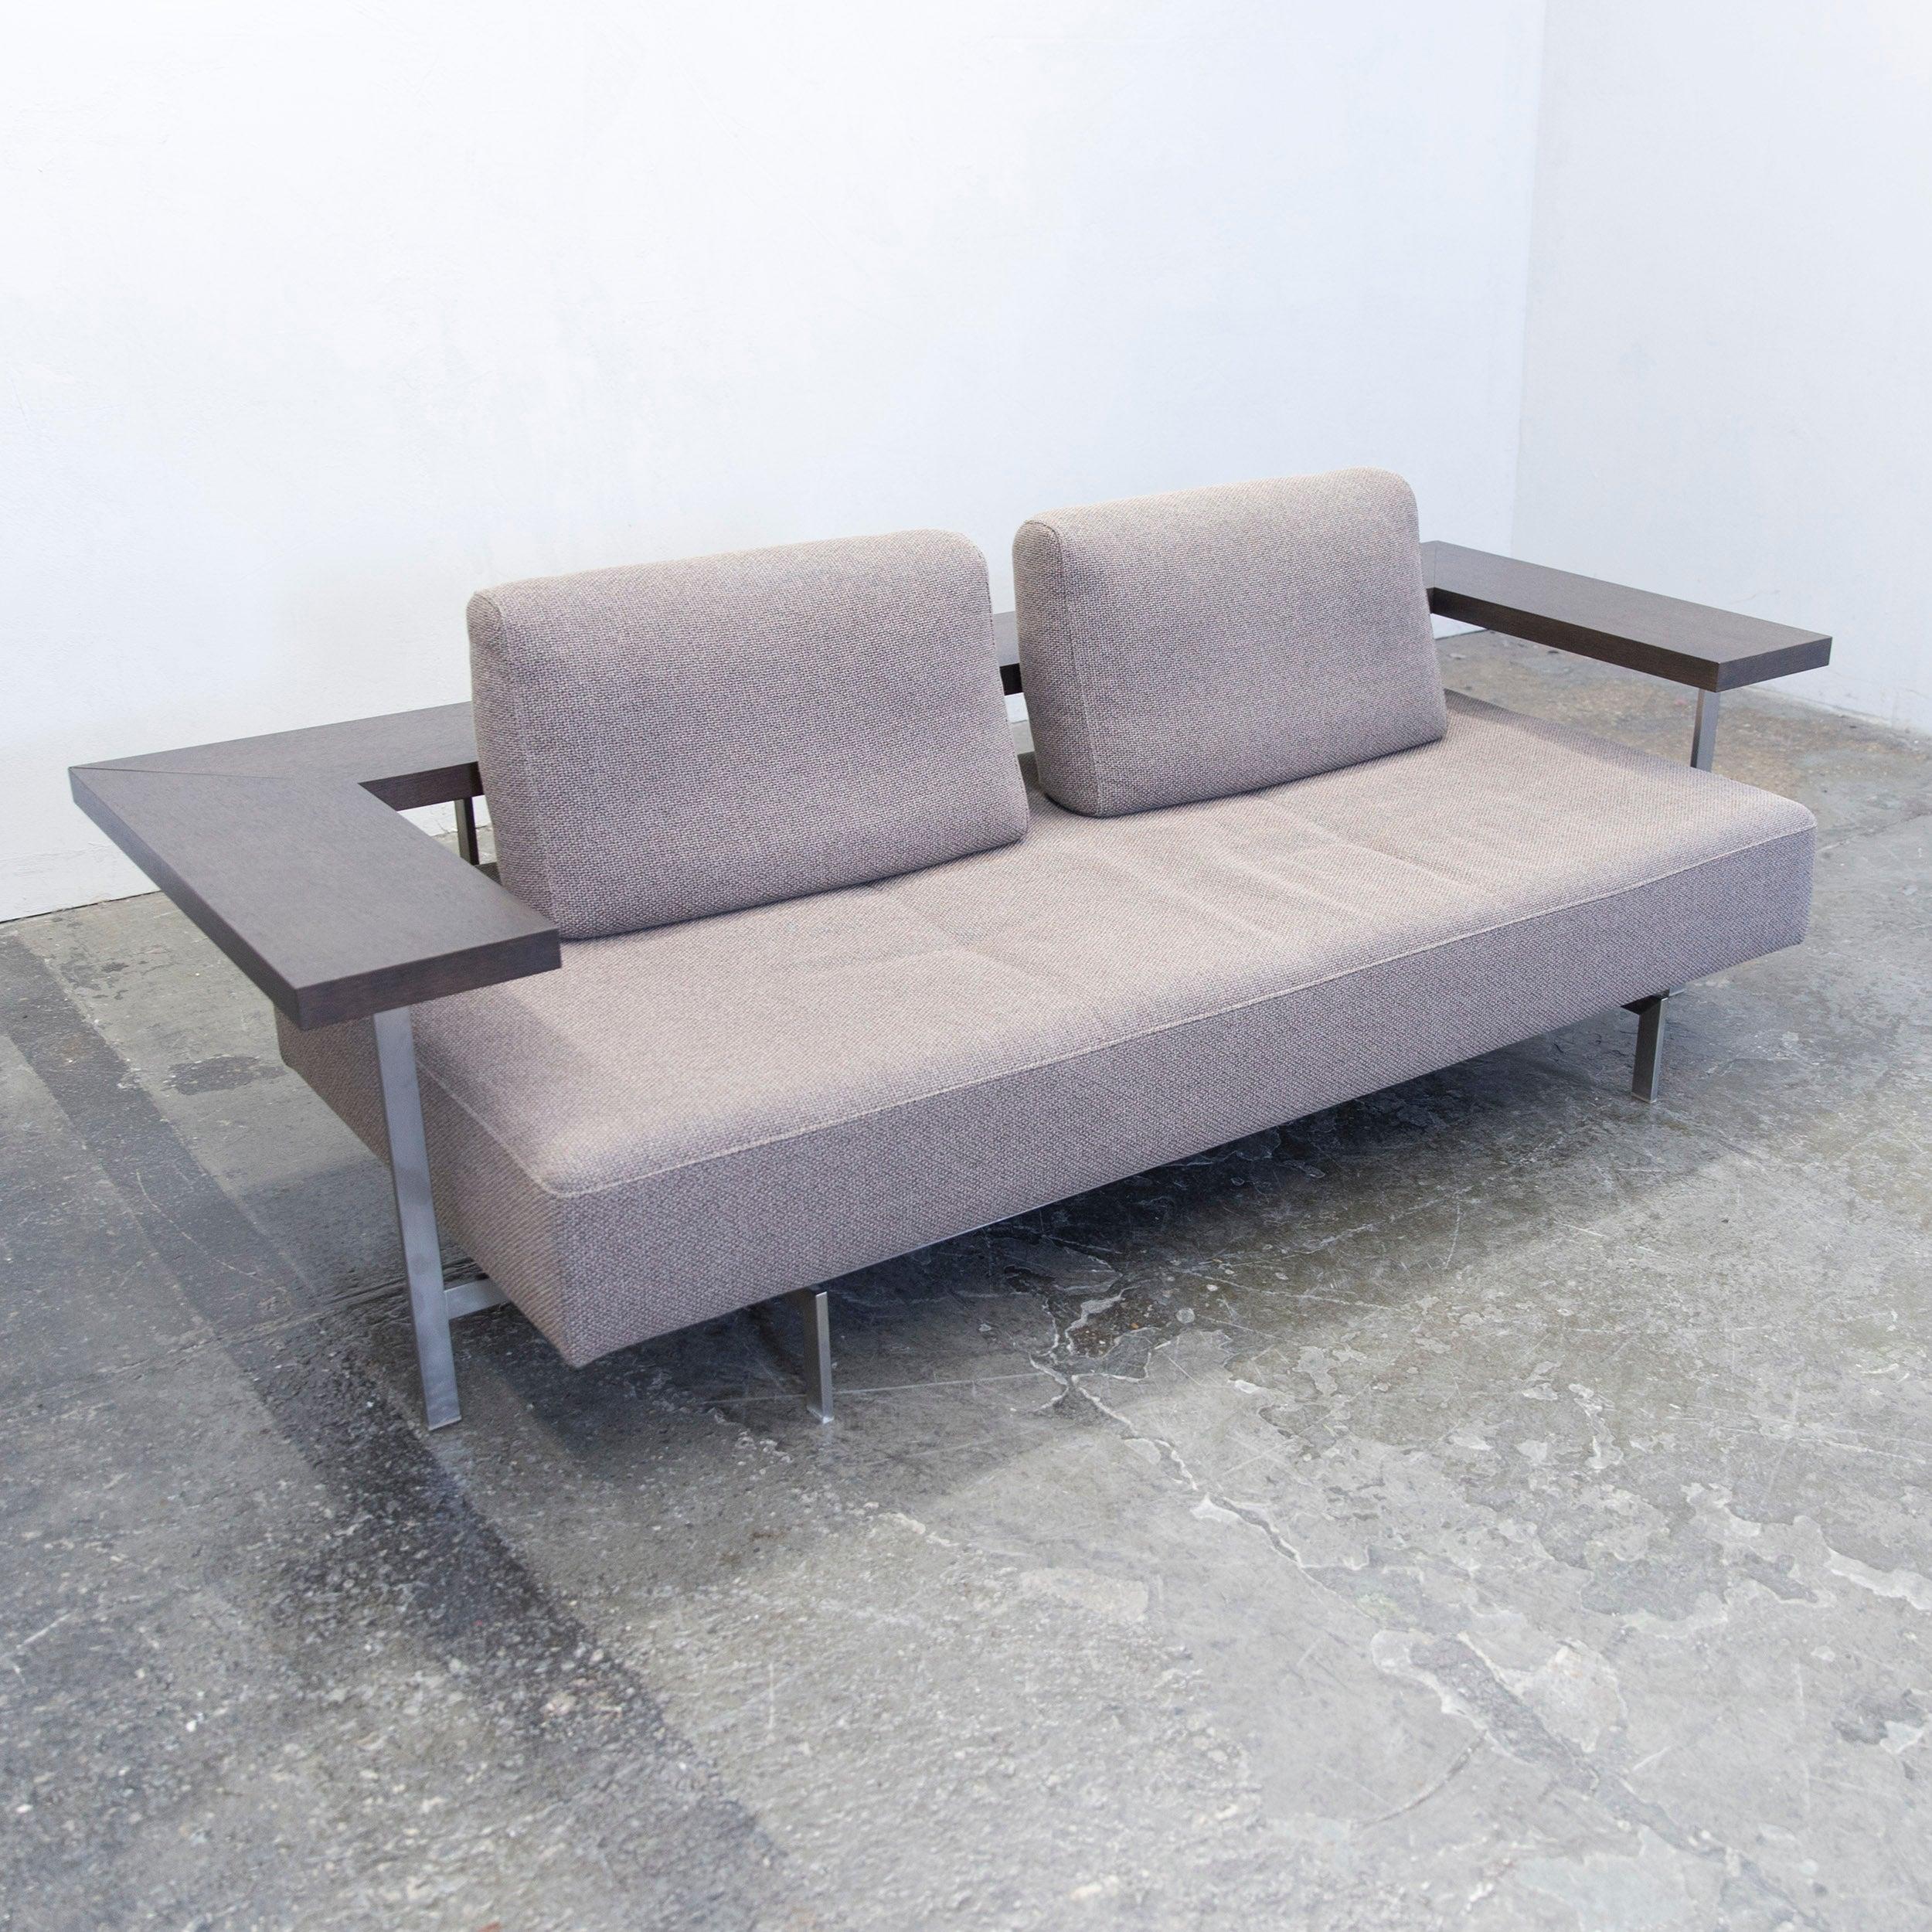 Sofa Modern Grau Wohndesign